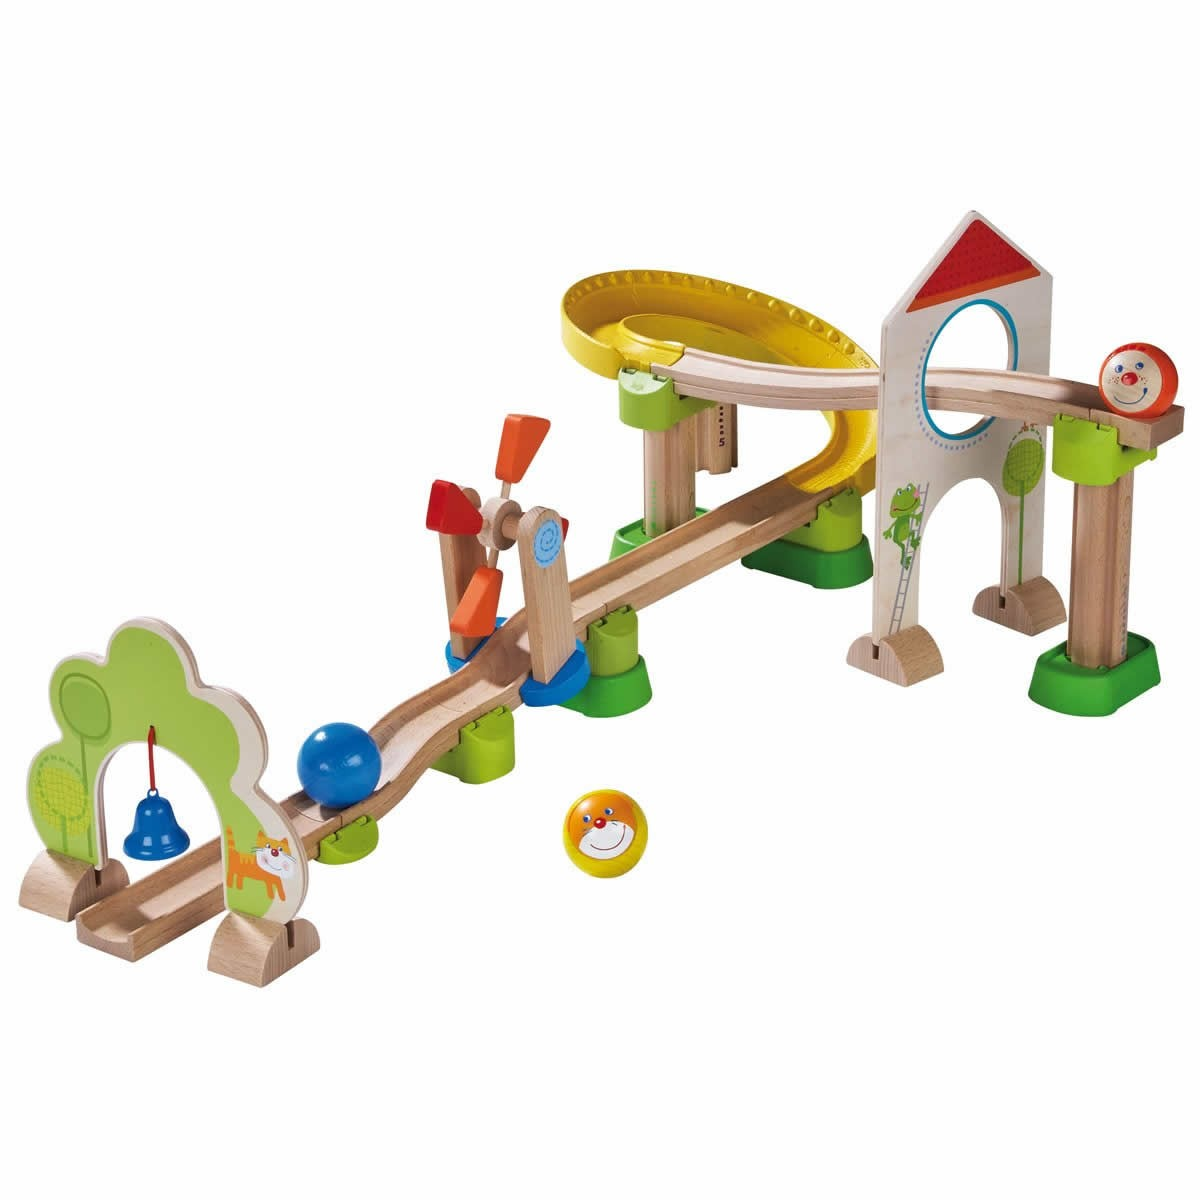 Haba Rollerby Windmill Ball Track